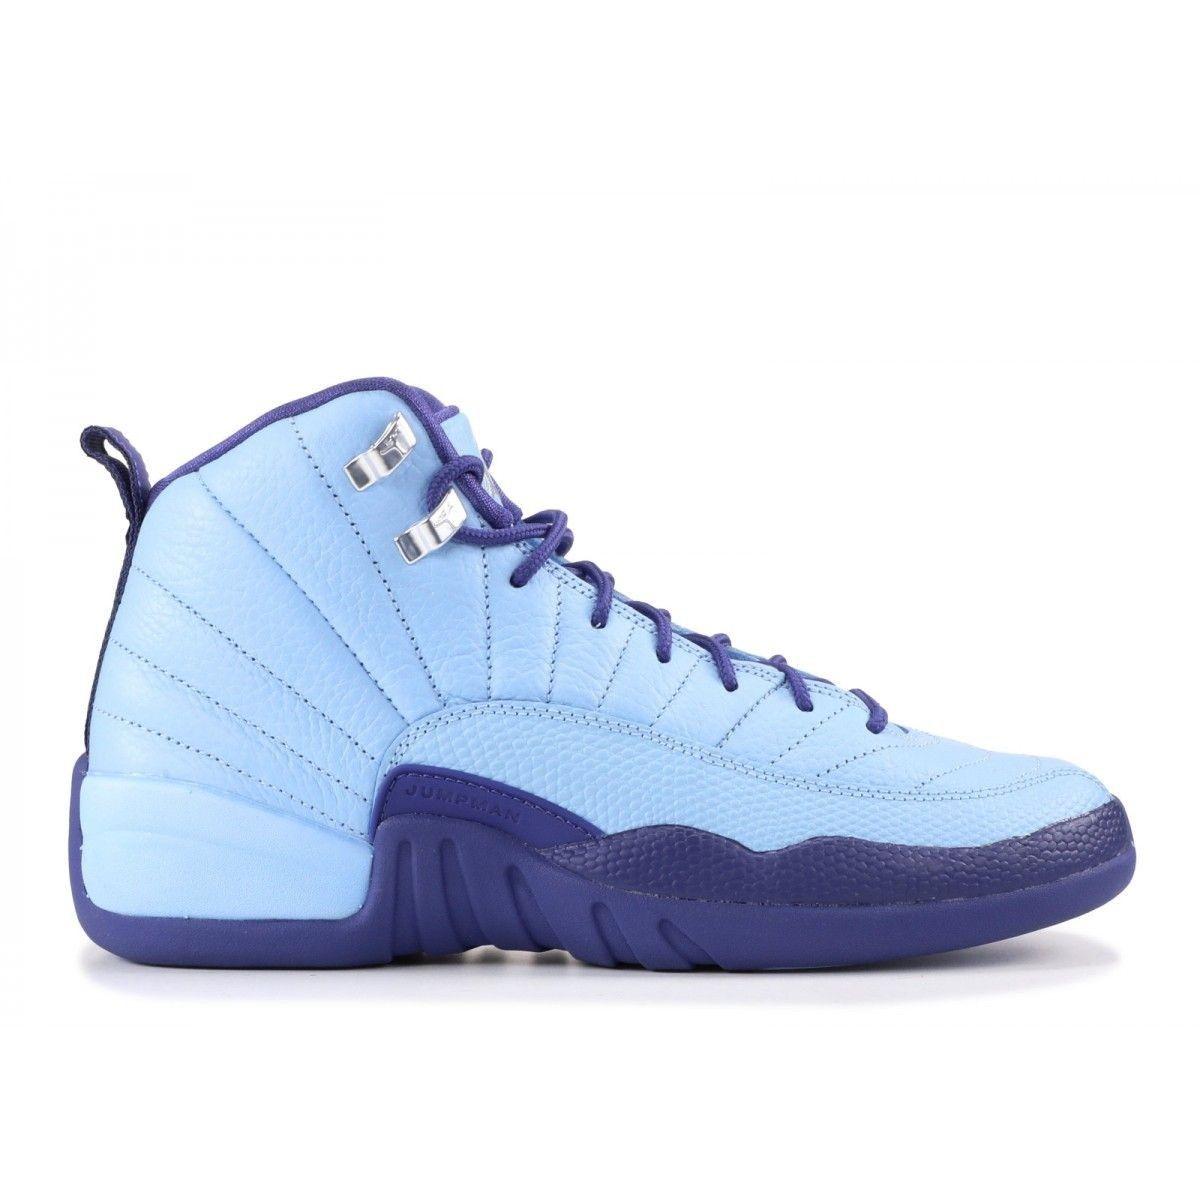 air jordan 12 bleu